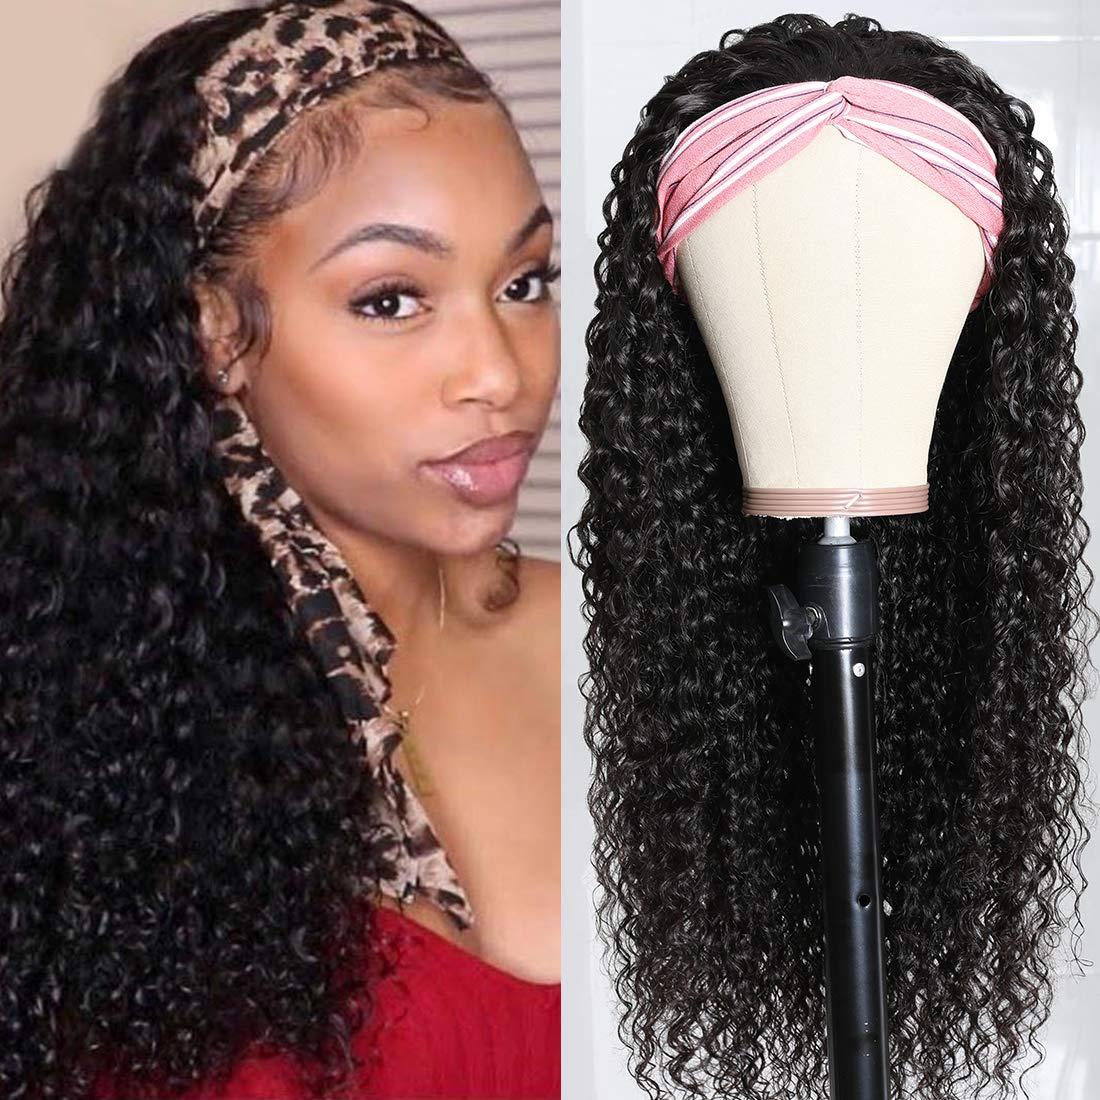 Nadula Hair Curly Headband Brazilian Easy-to-use Human Wig Popular brand in the world Jerry